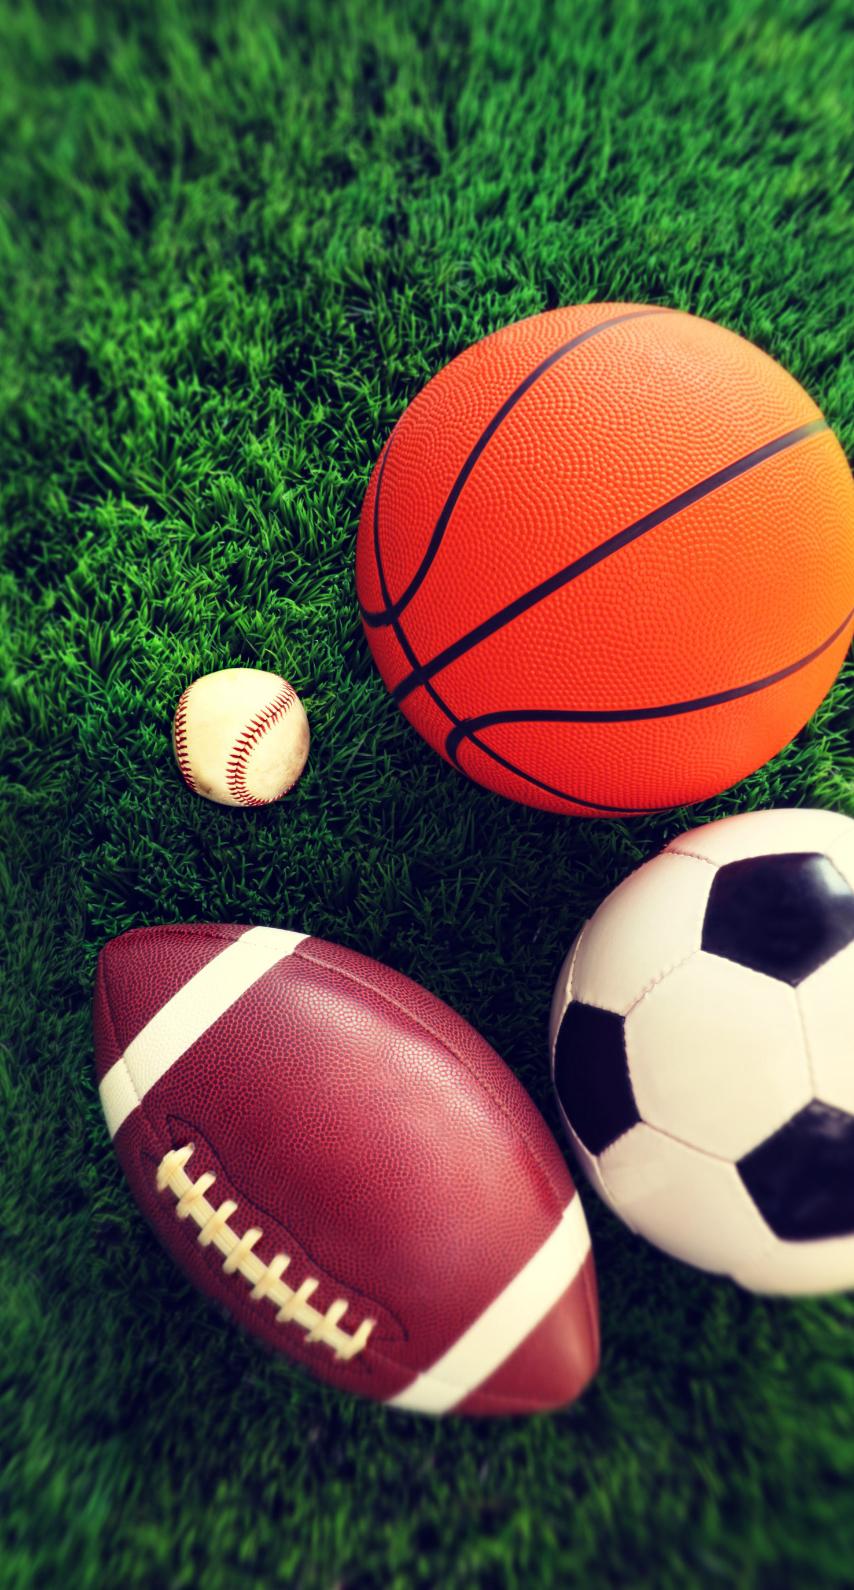 gameplan (sports), participate